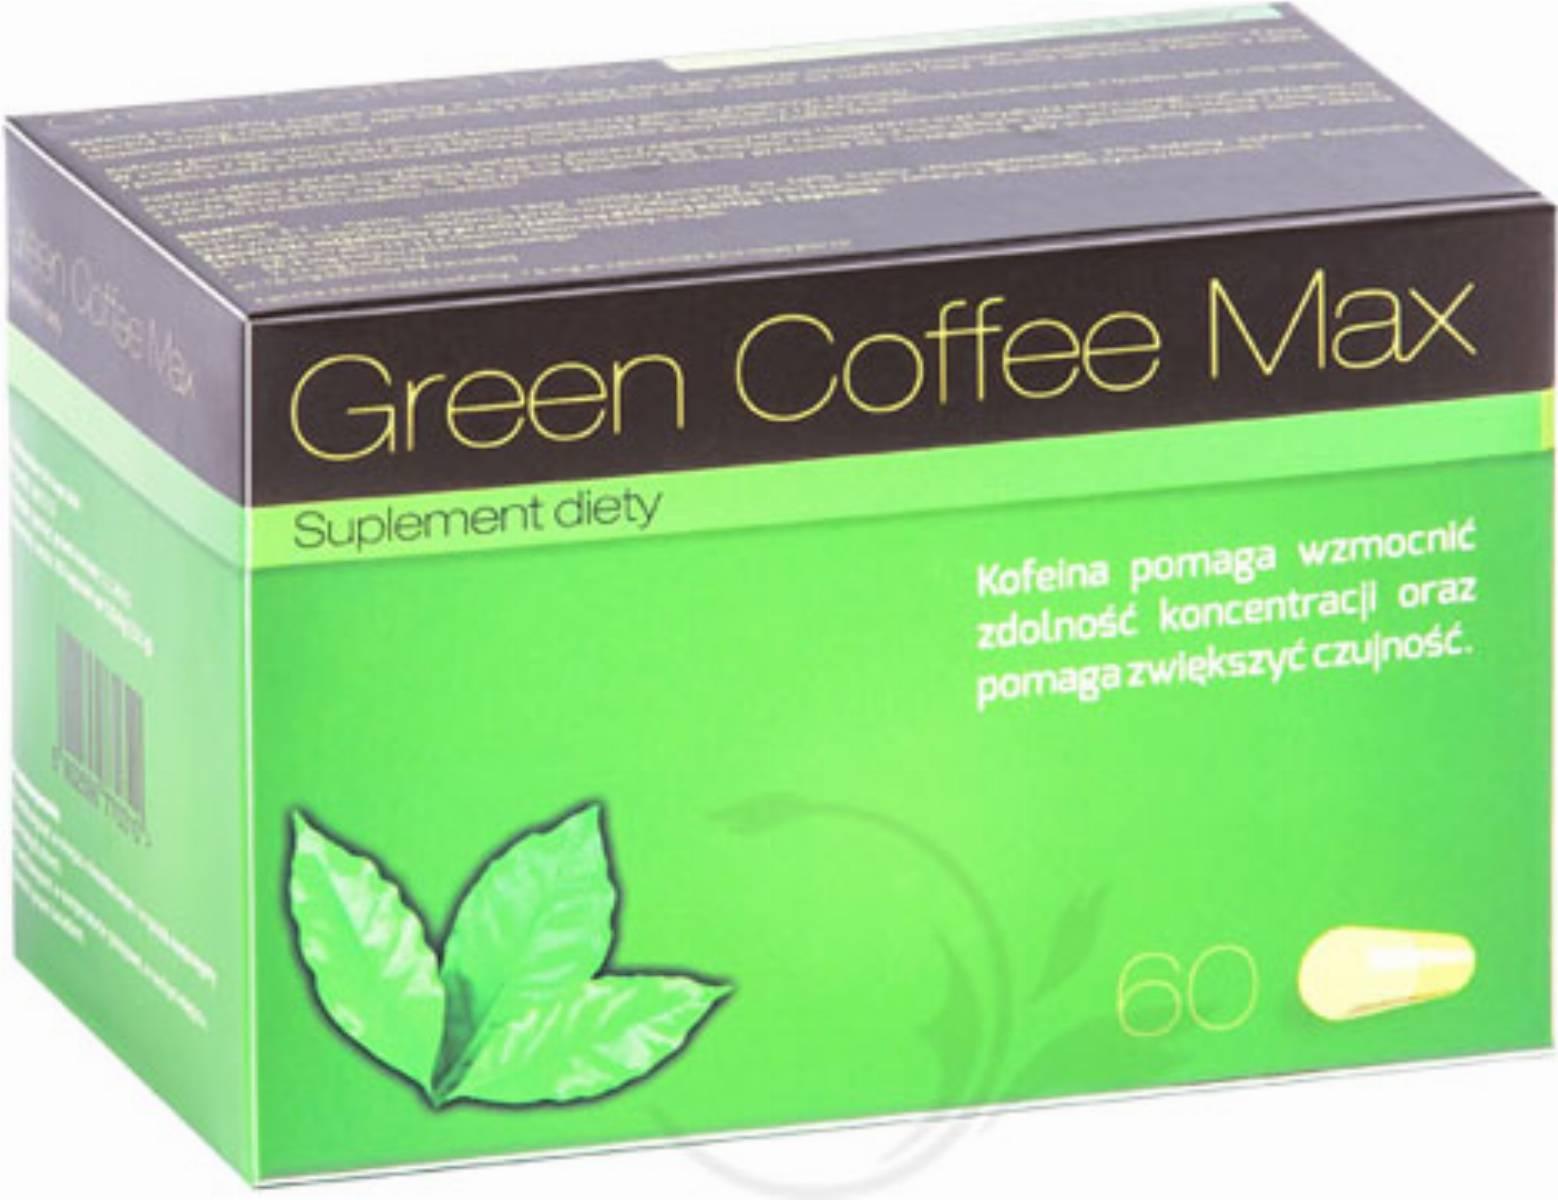 Green Coffee Max